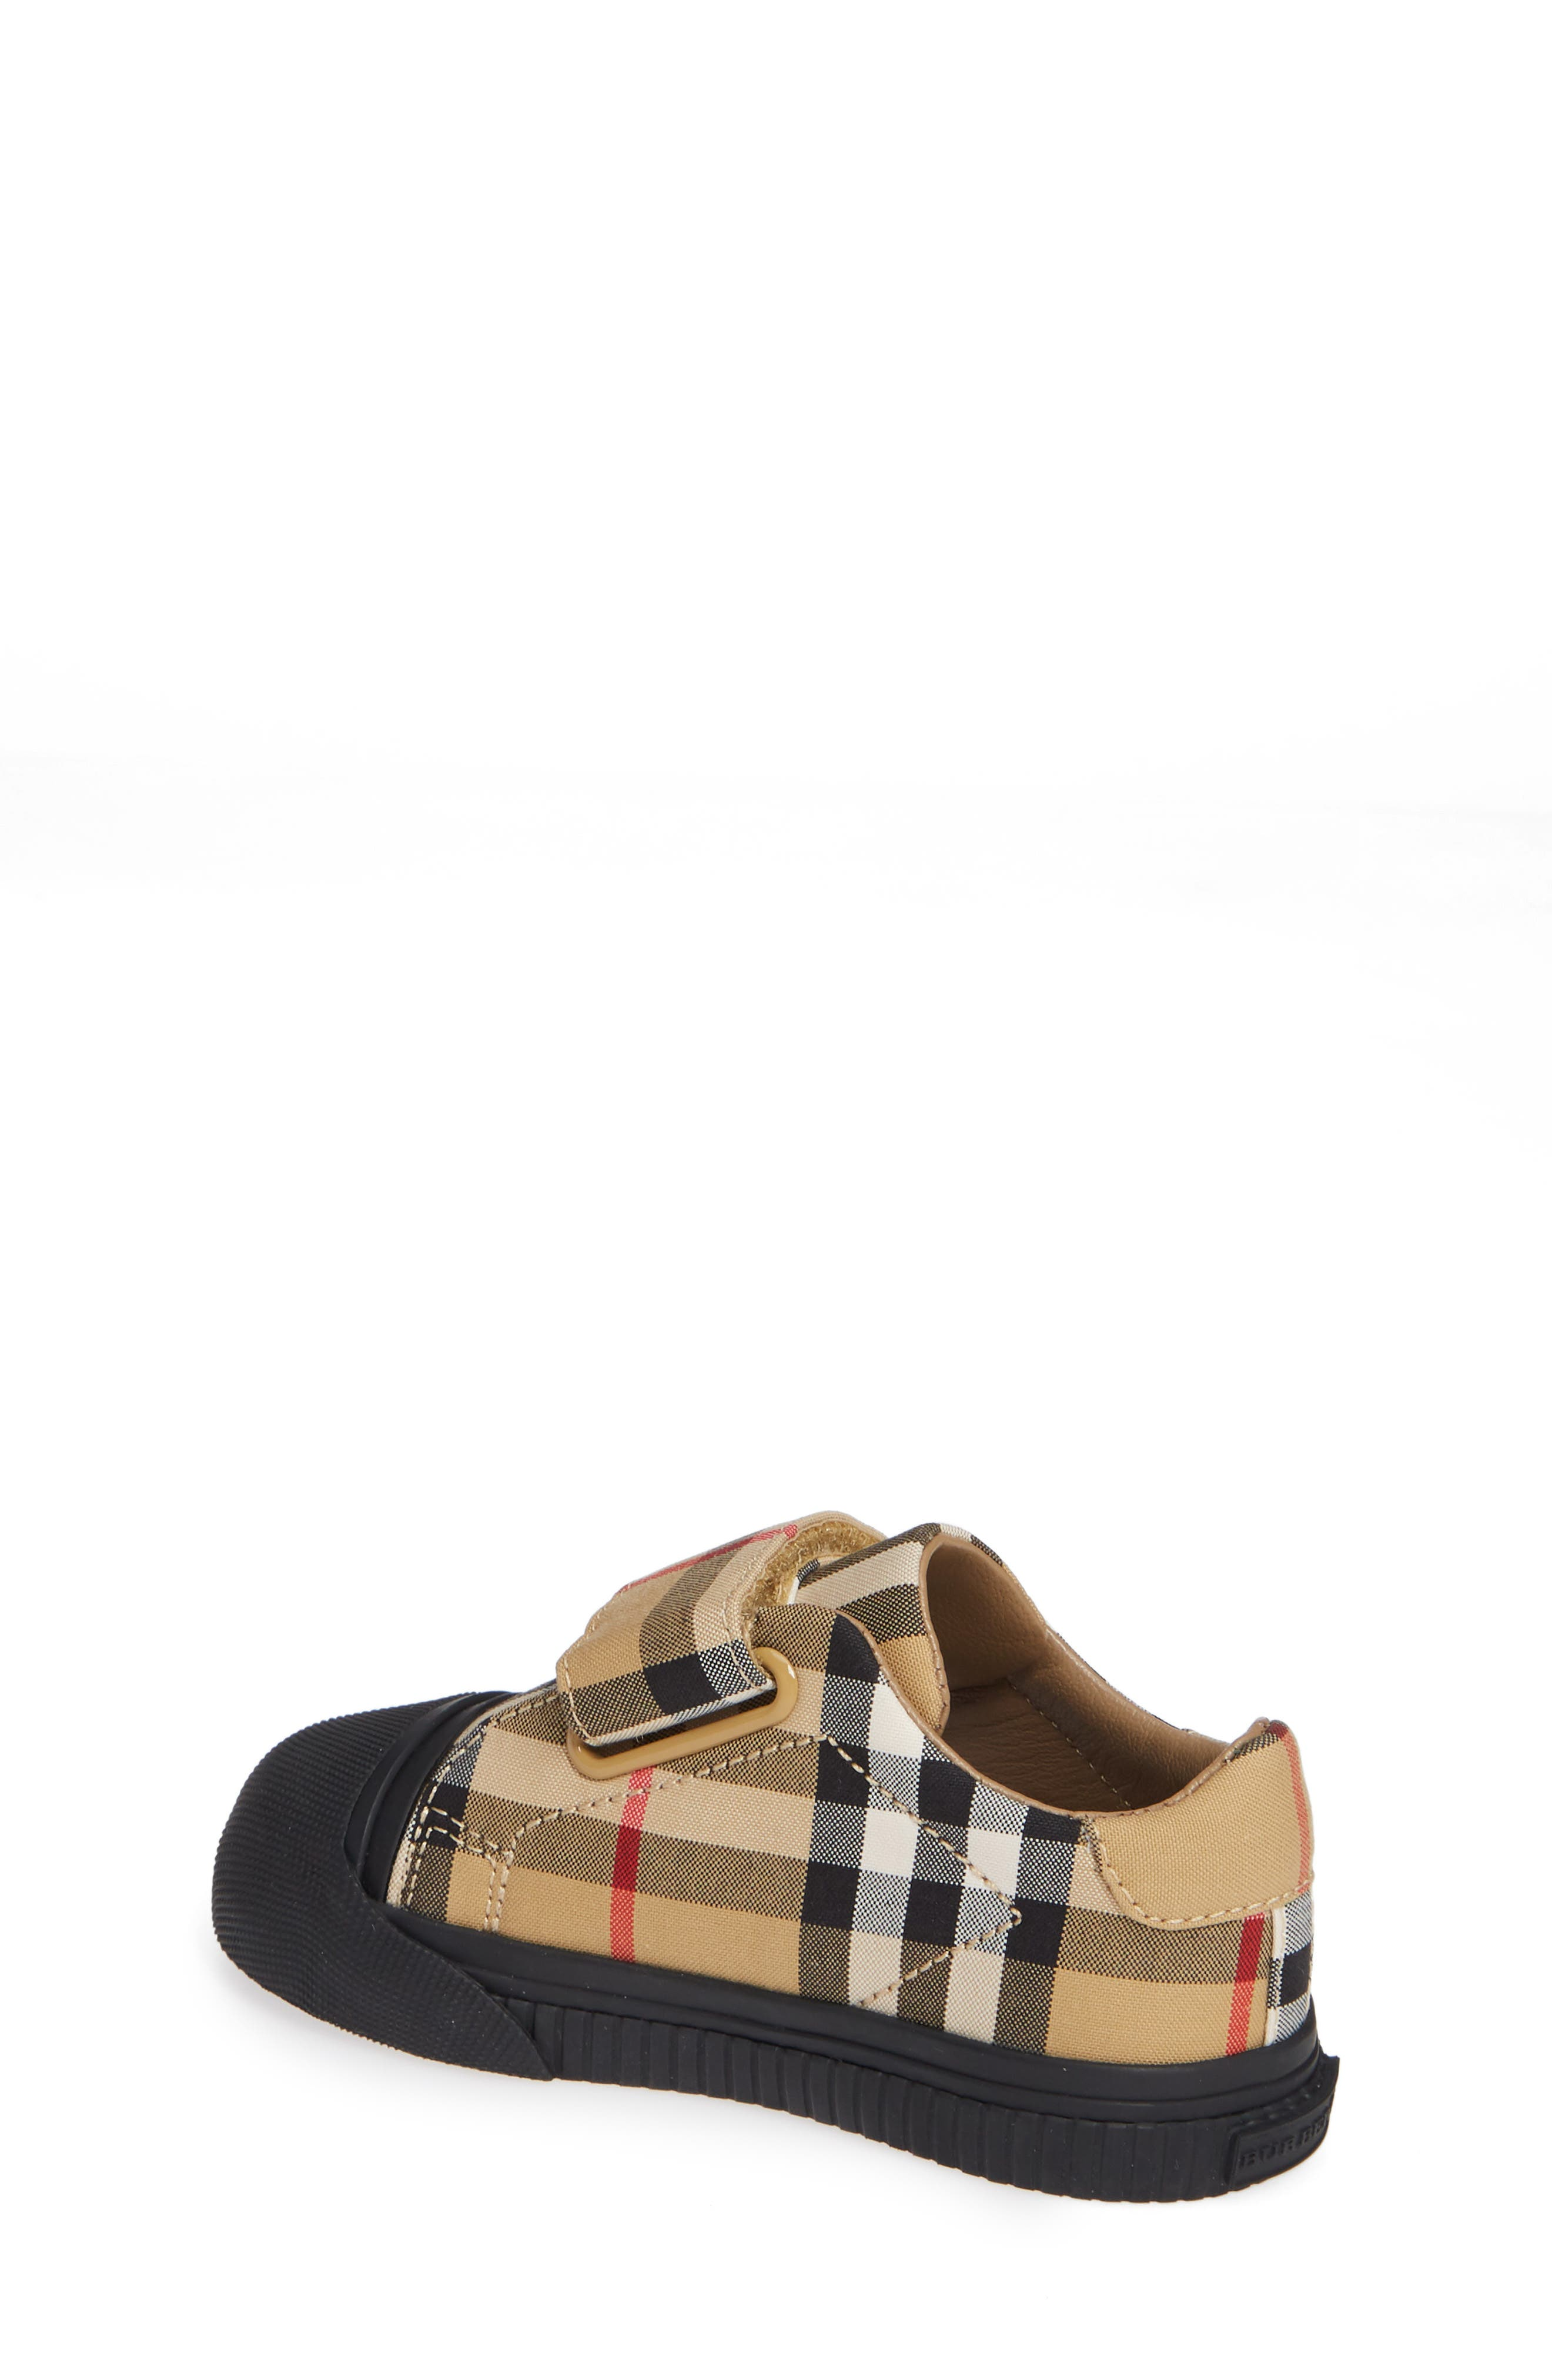 Beech Check Sneaker,                             Alternate thumbnail 2, color,                             001